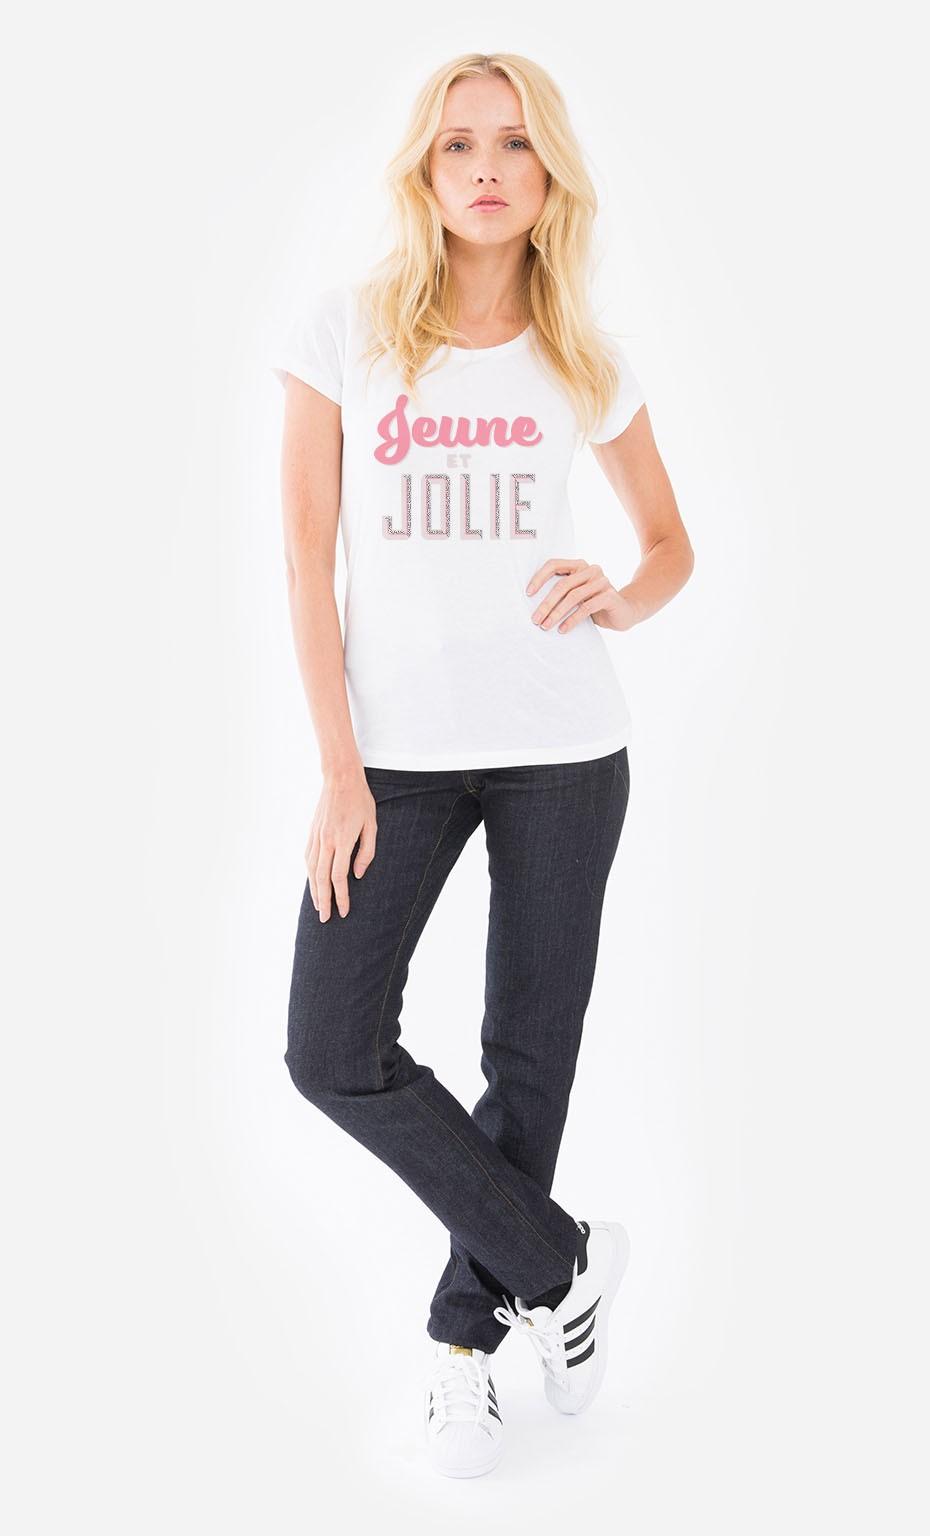 5d9d7c090 T-Shirt Femme Jeune et Jolie original et tendance - Wooop